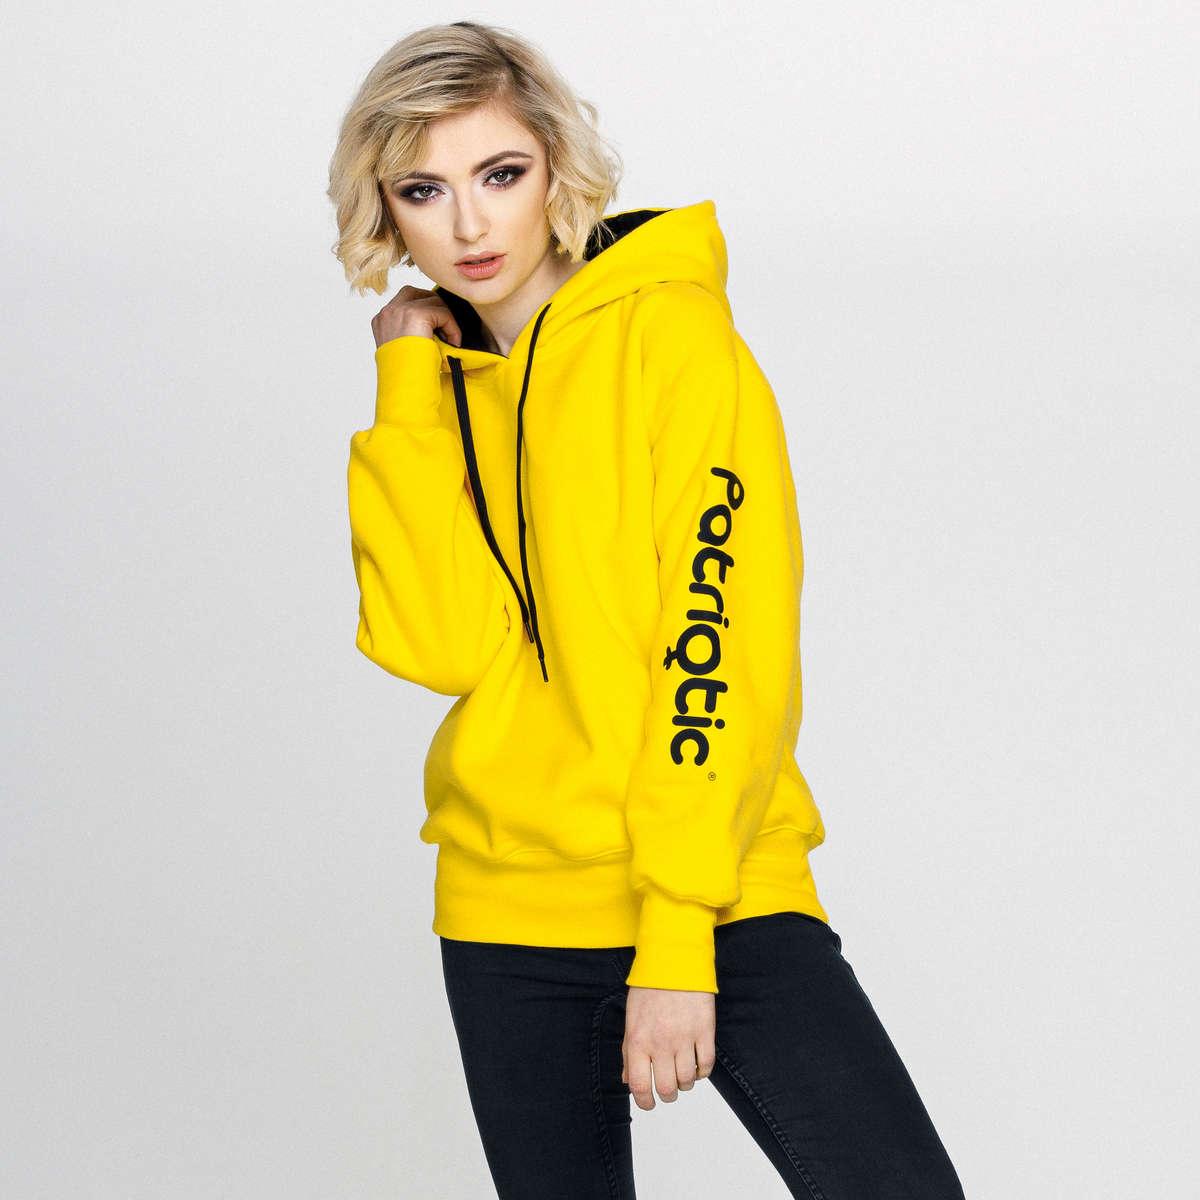 bluza damska z kapturem żółta